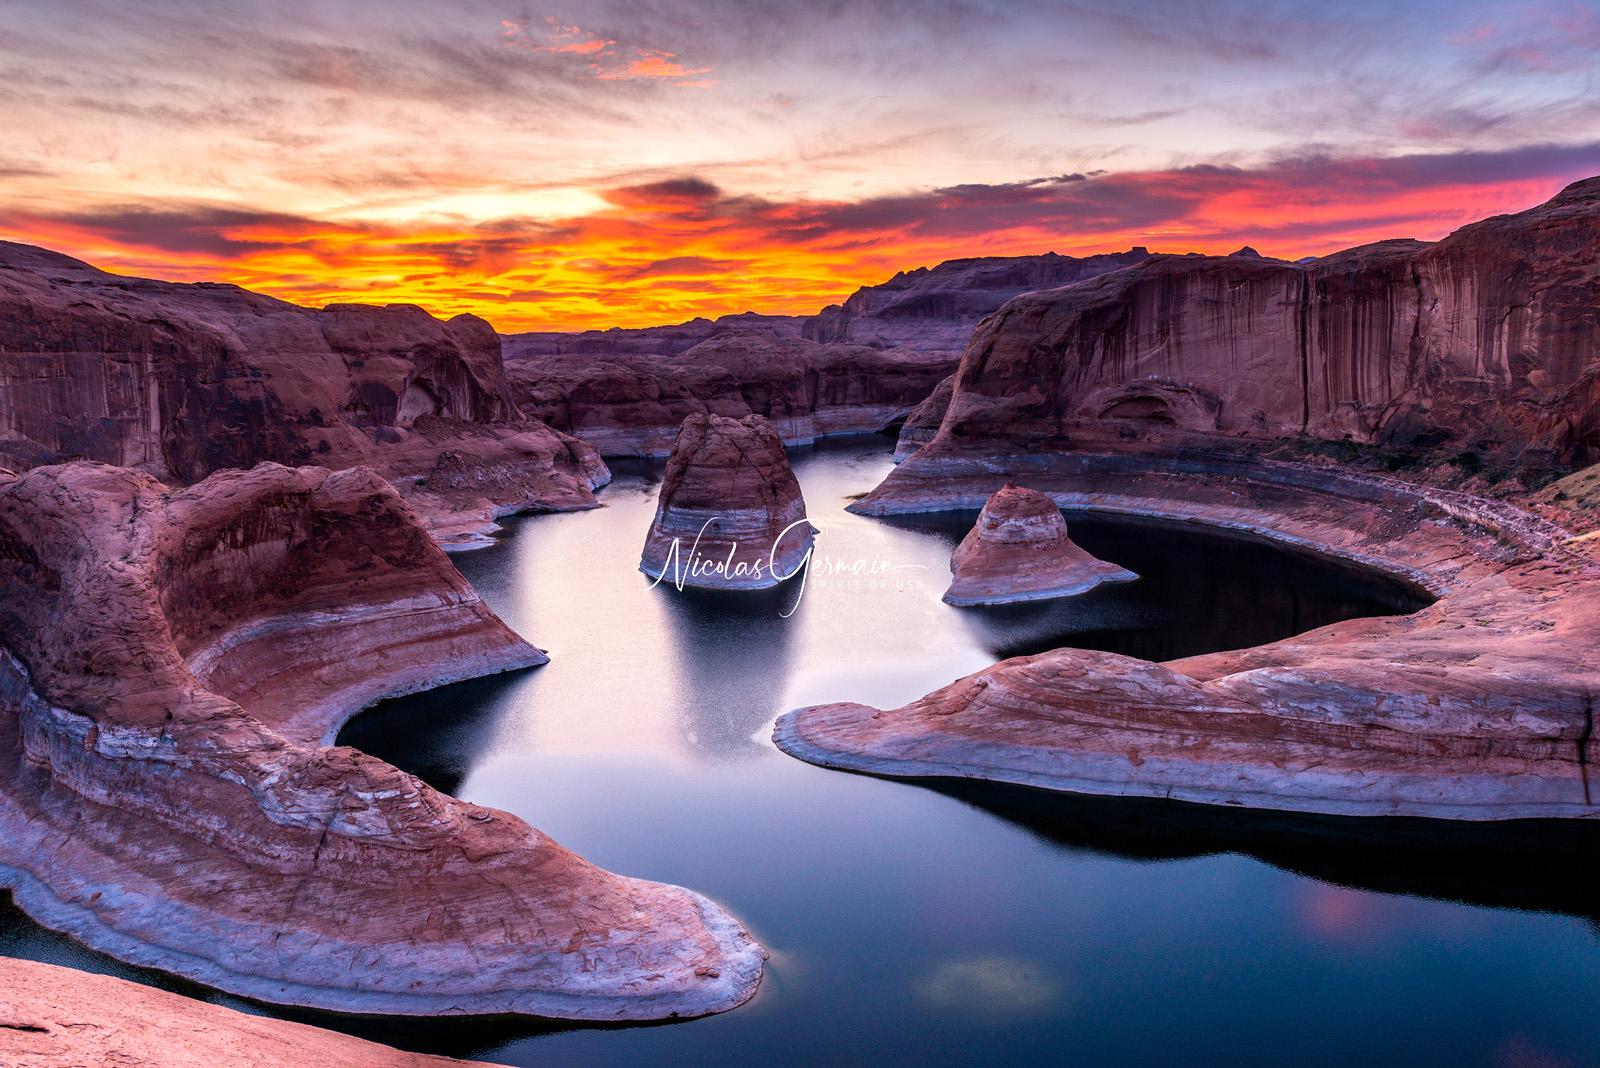 Reflection Canyon Sunrise - Nicolas Germain, Spirit of USA